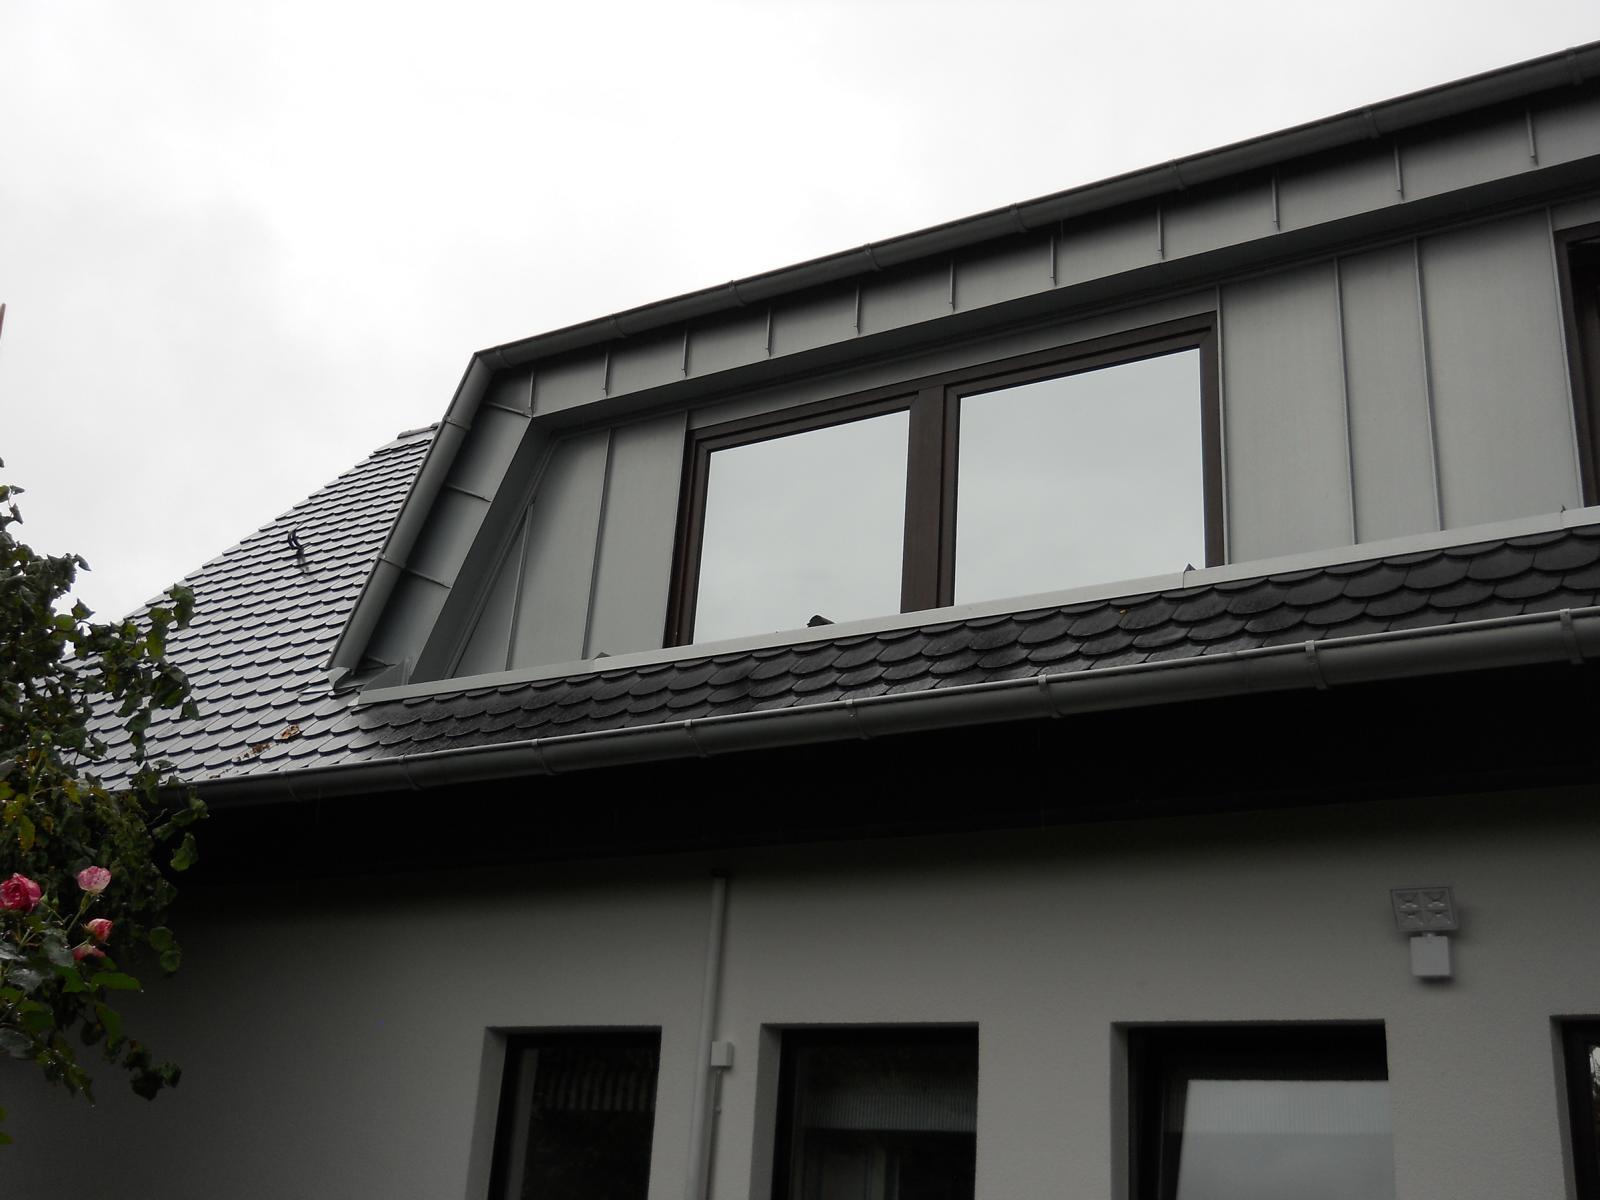 dachgaube bochum, dacherneuerung, stehfalzdeckung, dachdeckerei deckert bochum, peter deckert, dachd